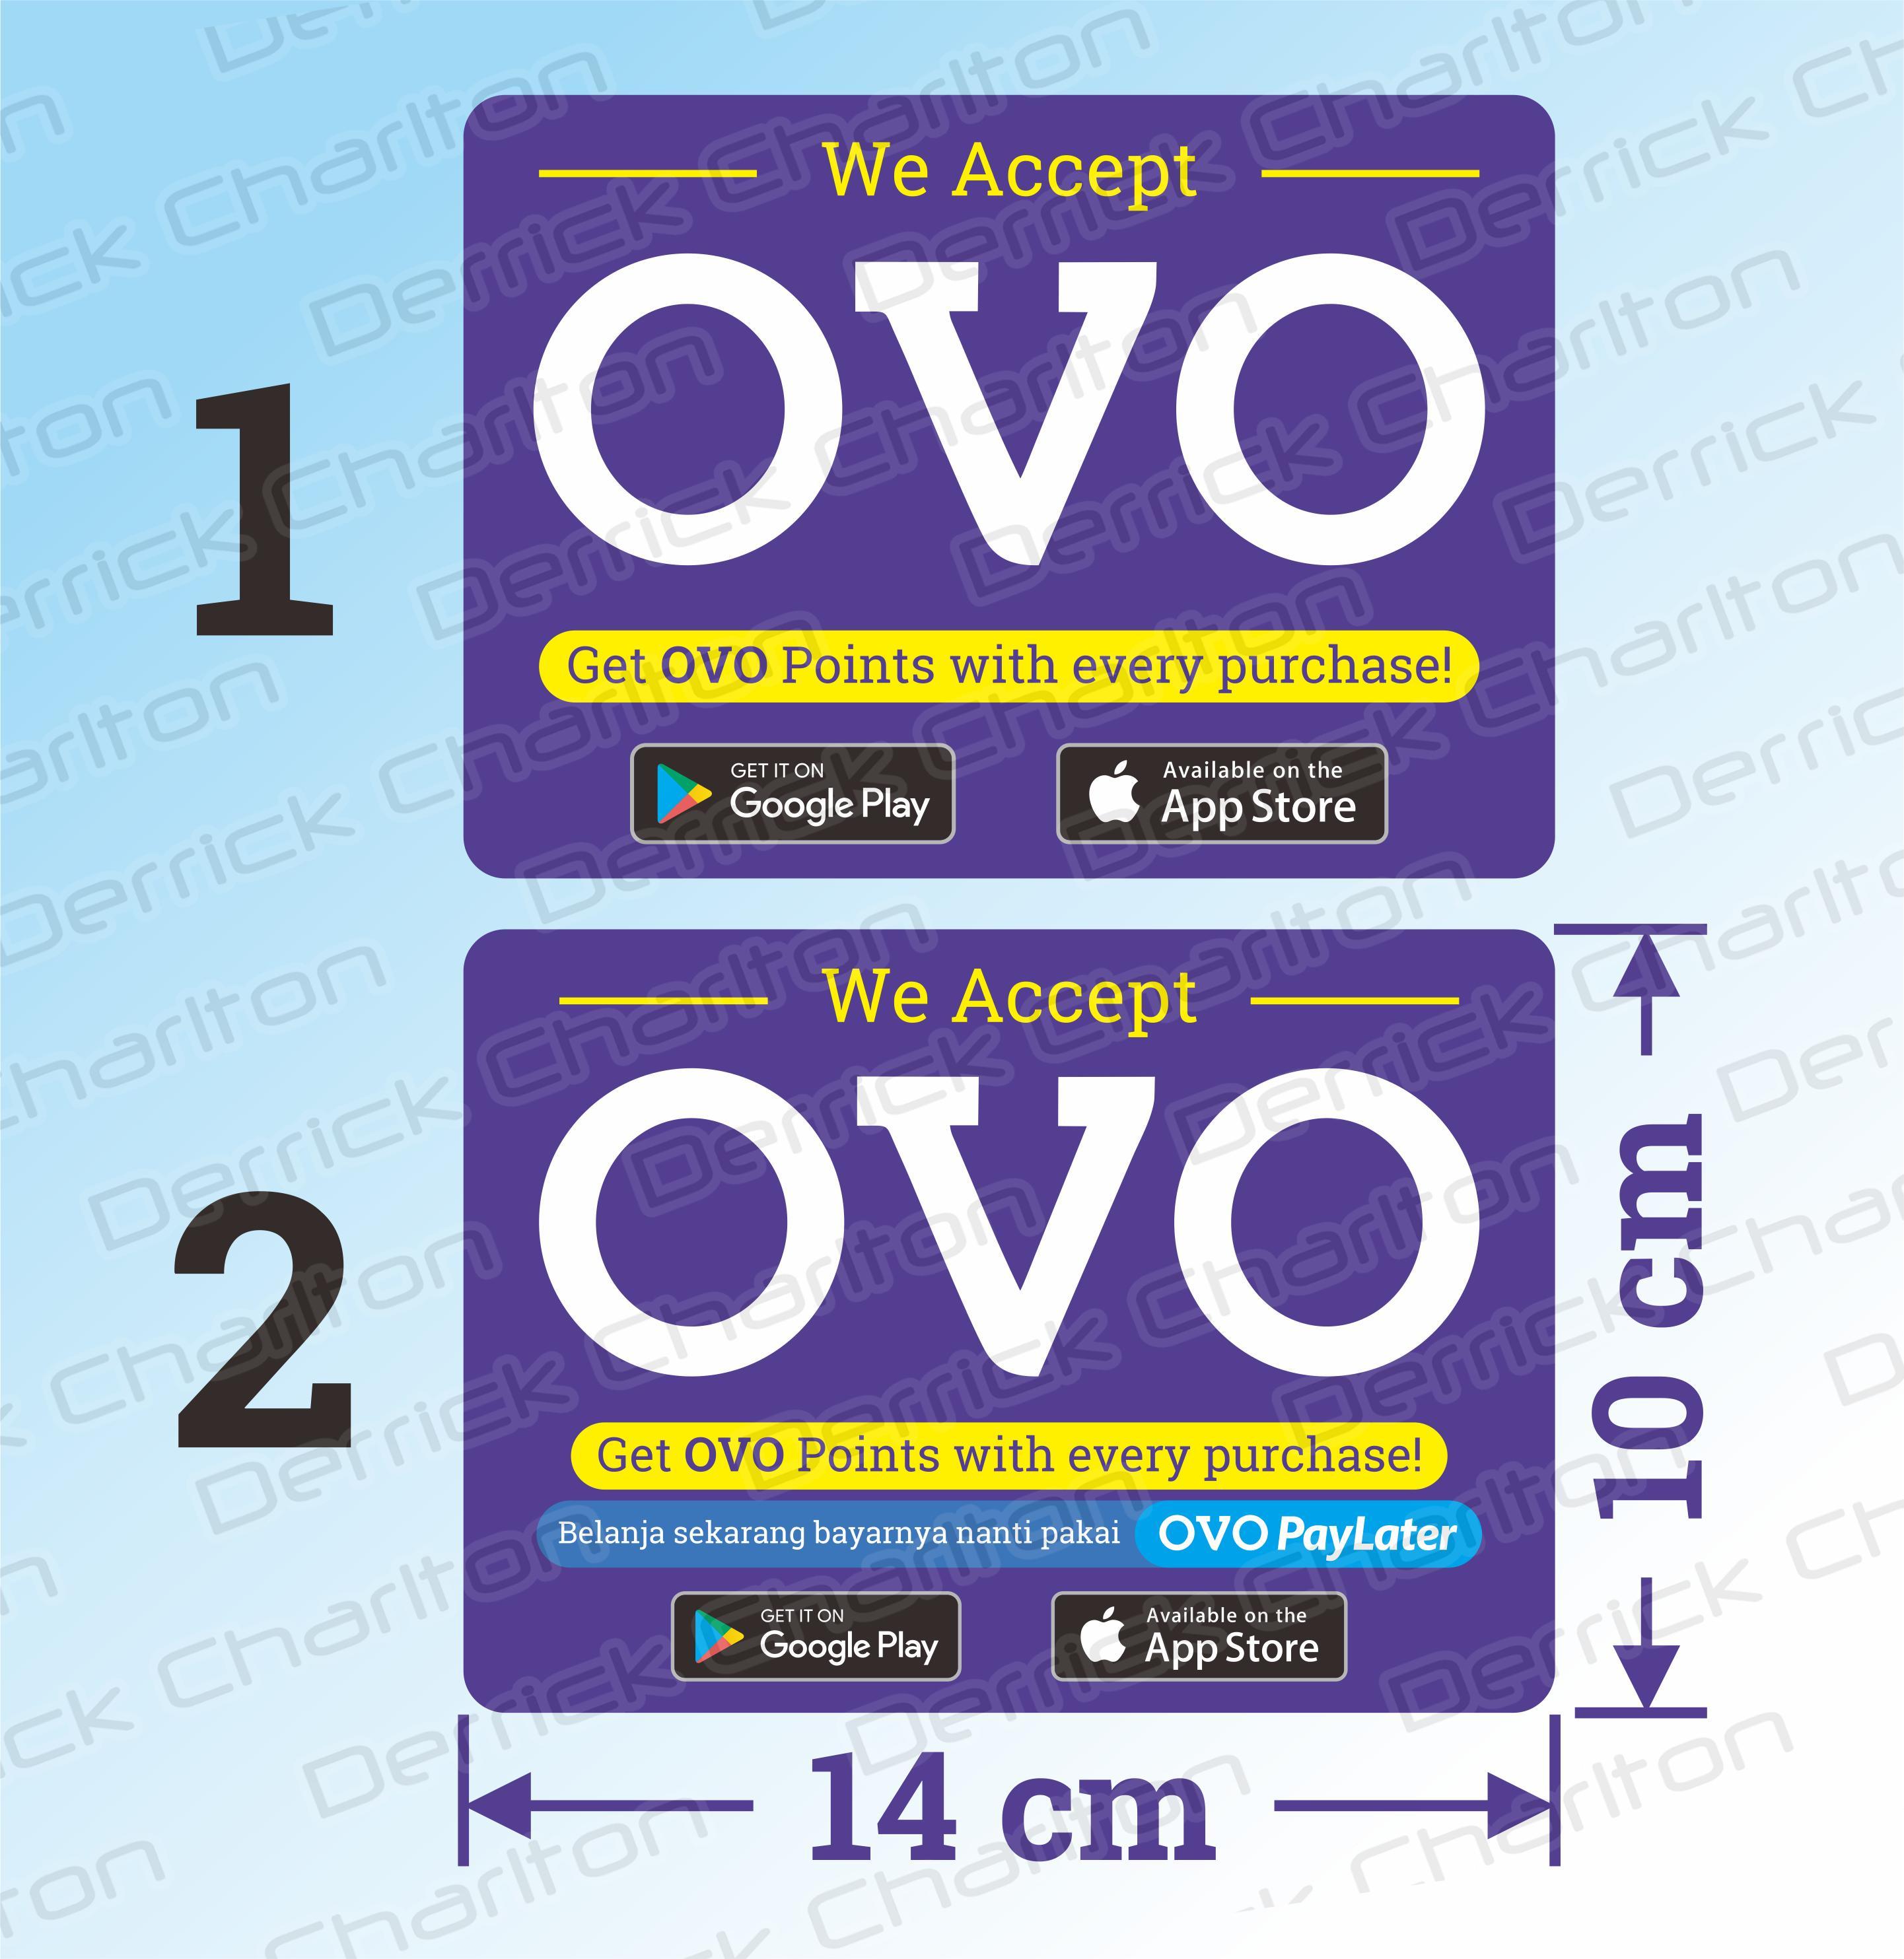 Wall Sticker OVO Pembayaran Digital Non Tunai Cashless Dinding Kaca Resto Kafe Rumah Makan Vinyl Stiker Tahan Air 14 x 10 cm (2 pcs)